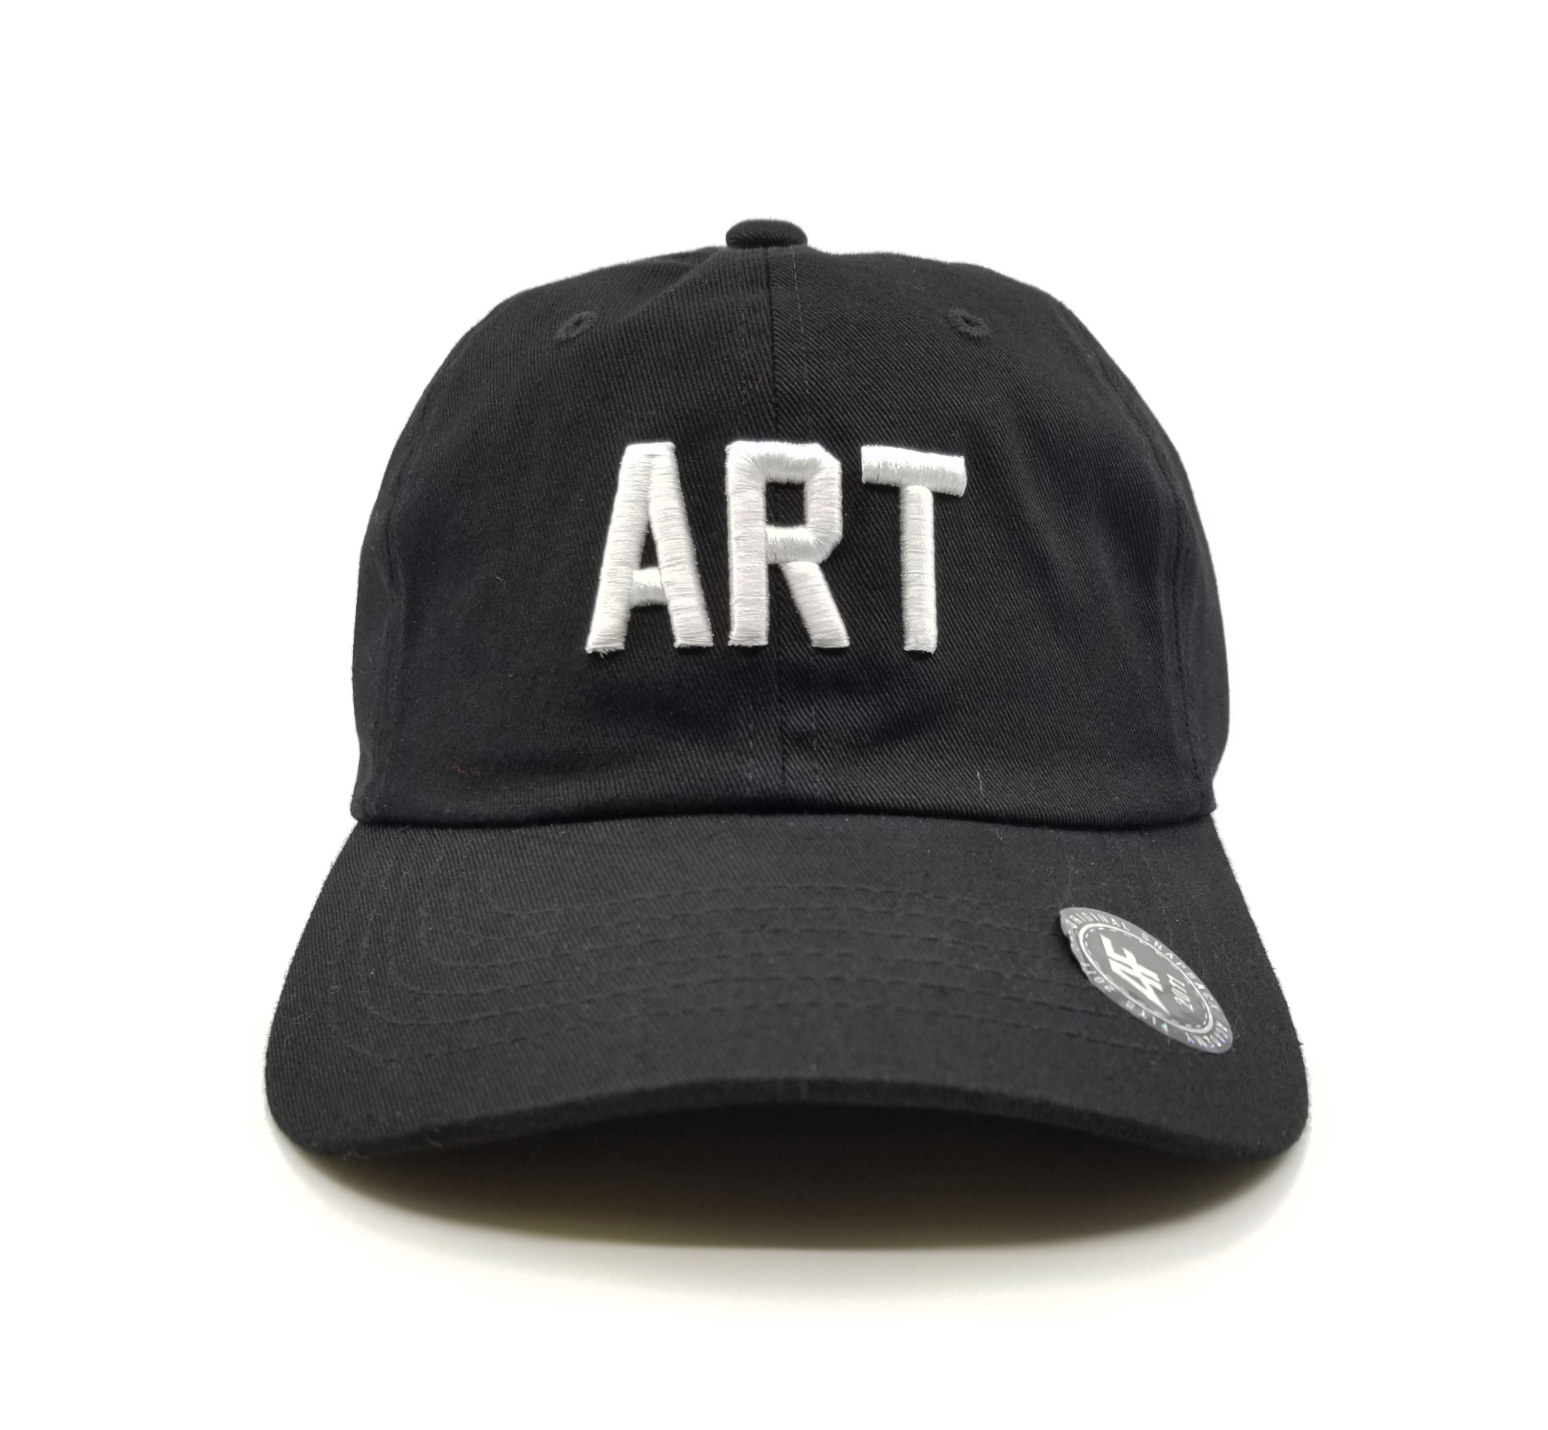 1abfacc05ef10 Dad Hat - Black White - Branded Arts